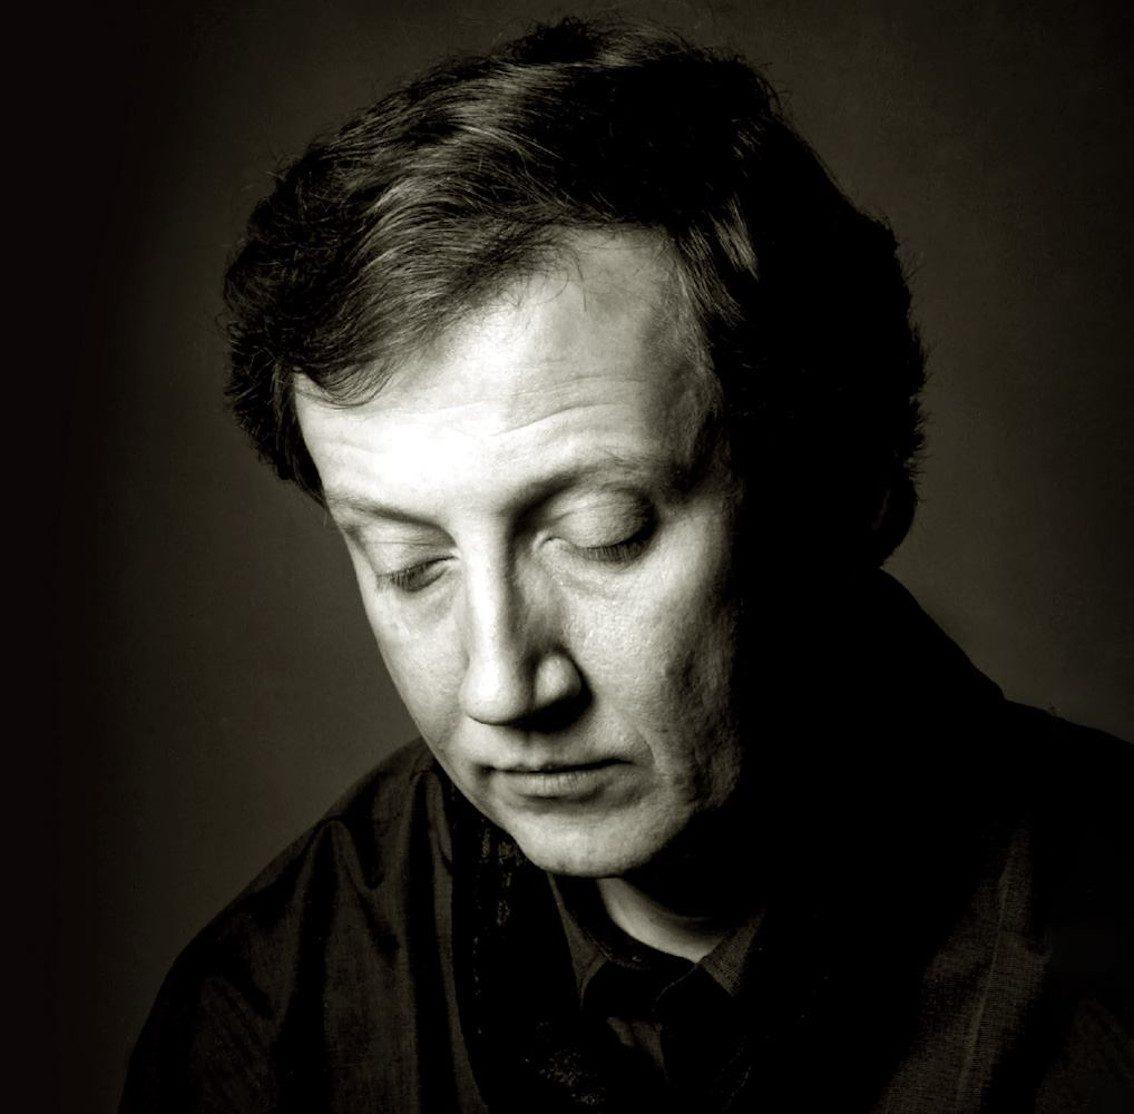 Wim Mertens lands all new album: 'The Gaze of the West' featuring 23 musicians